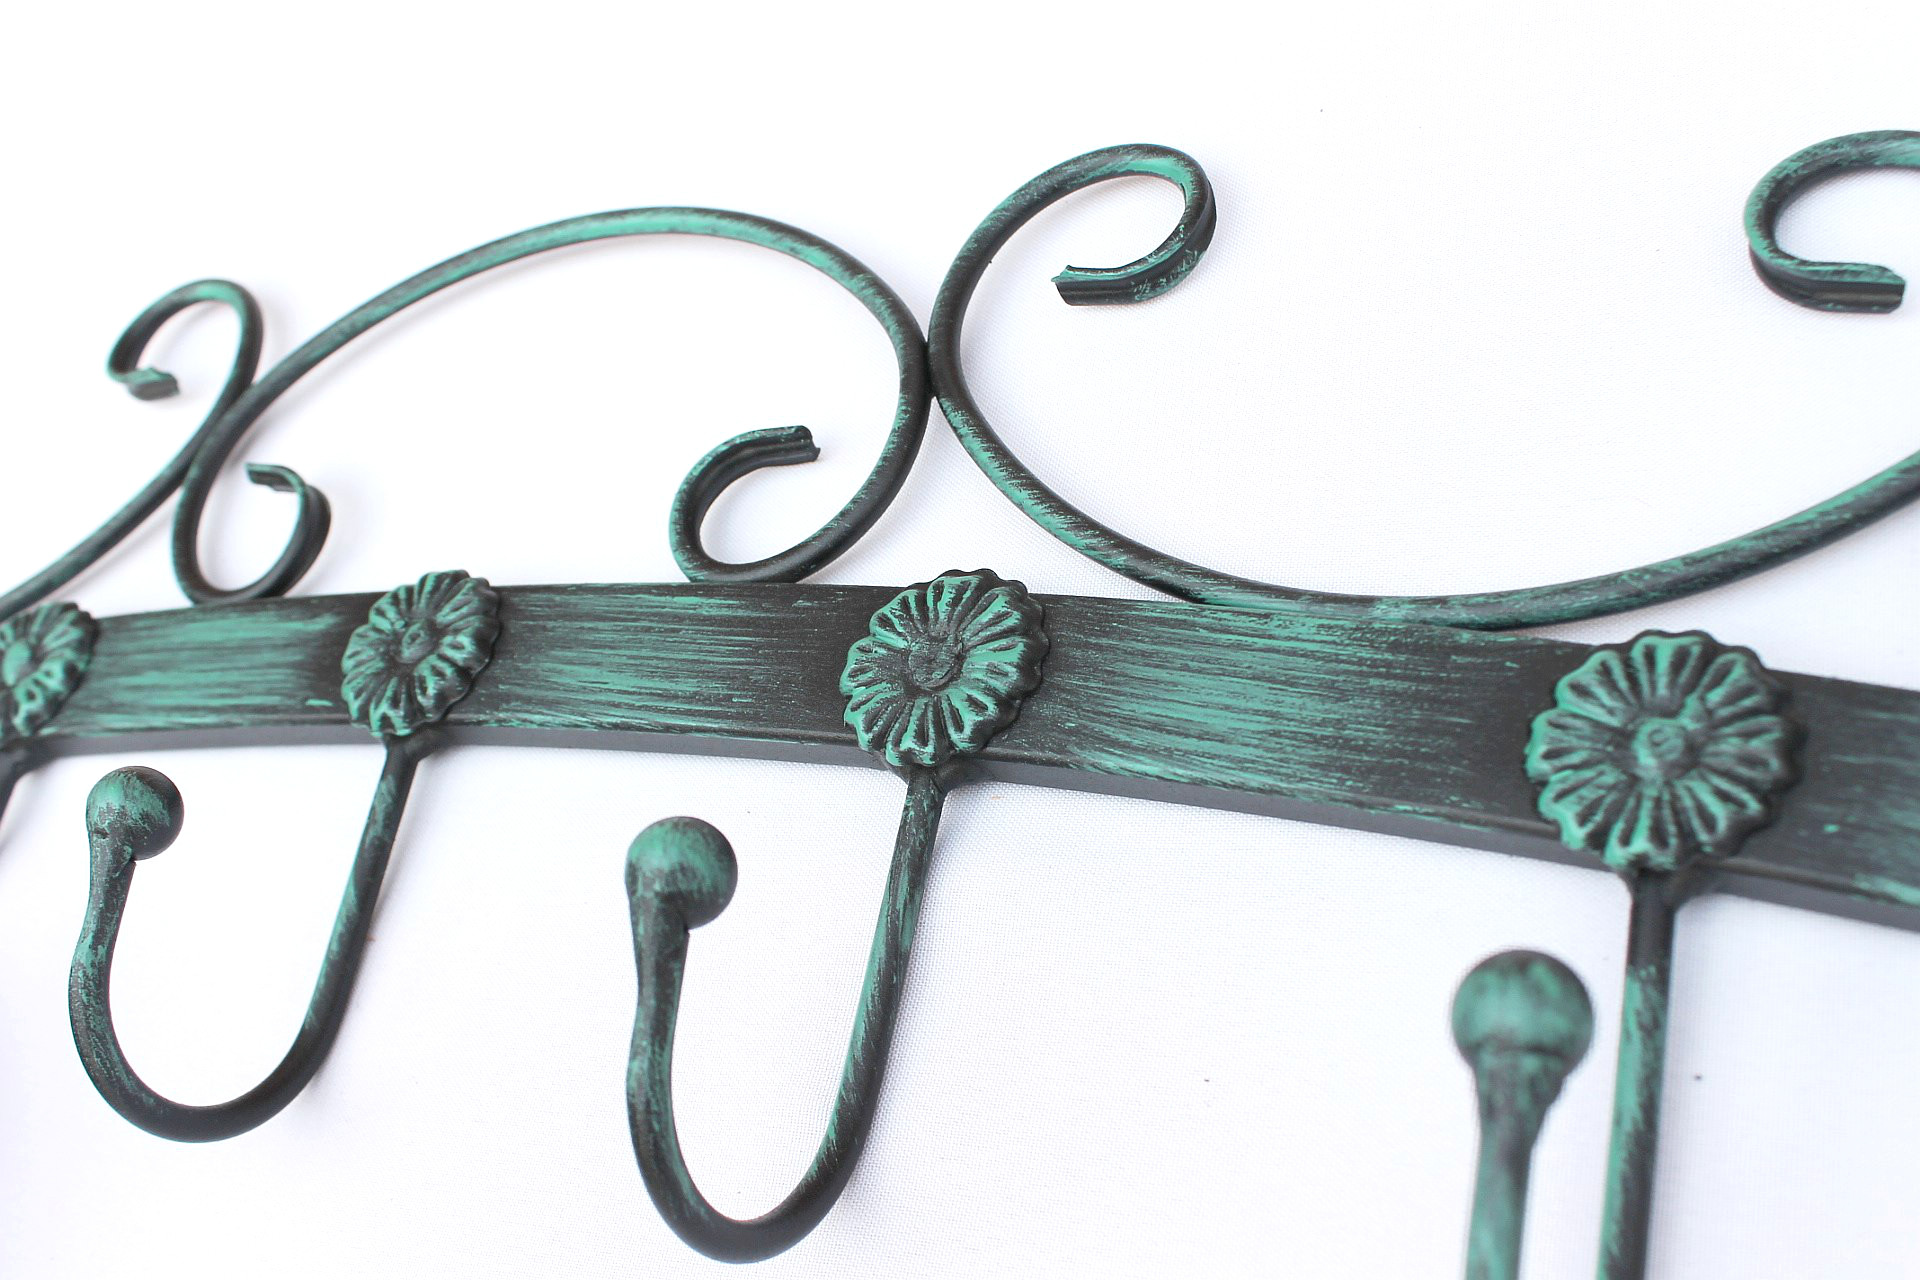 Garderobe wandhaken bo 93545 wandgarderobe hakenleiste for Buromobel aus metall